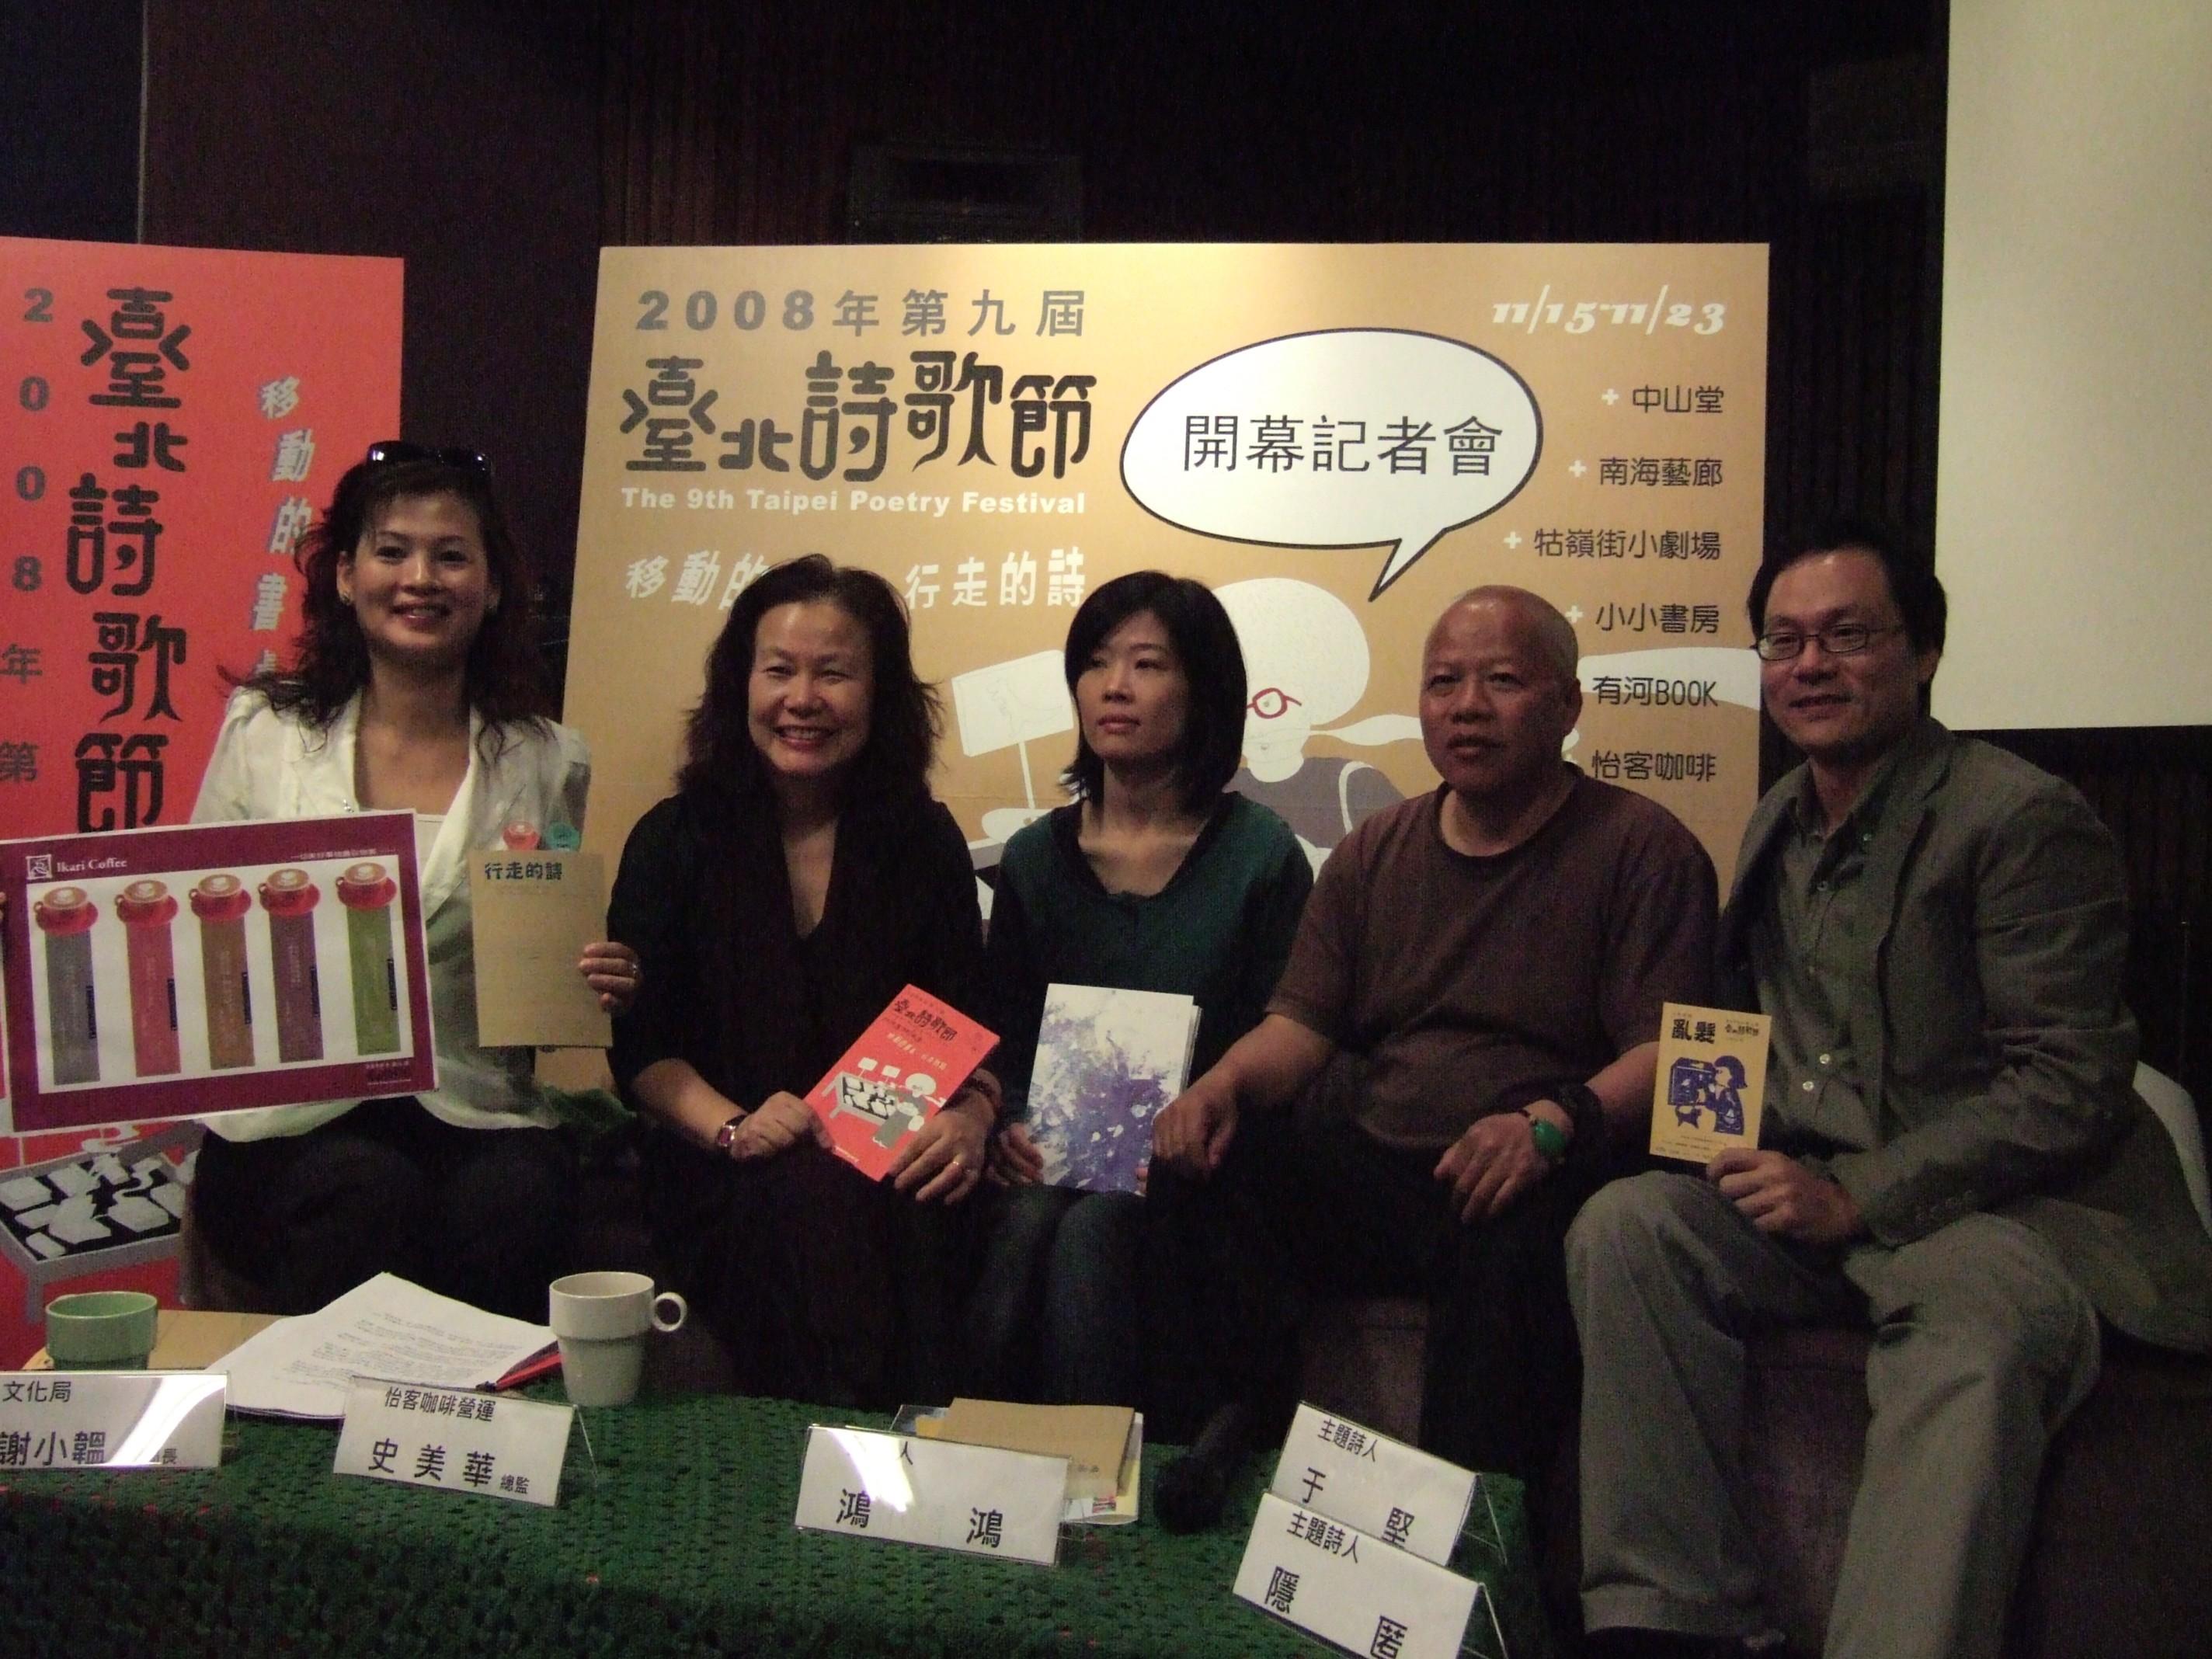 9th Taipei Poetry Festival 2008